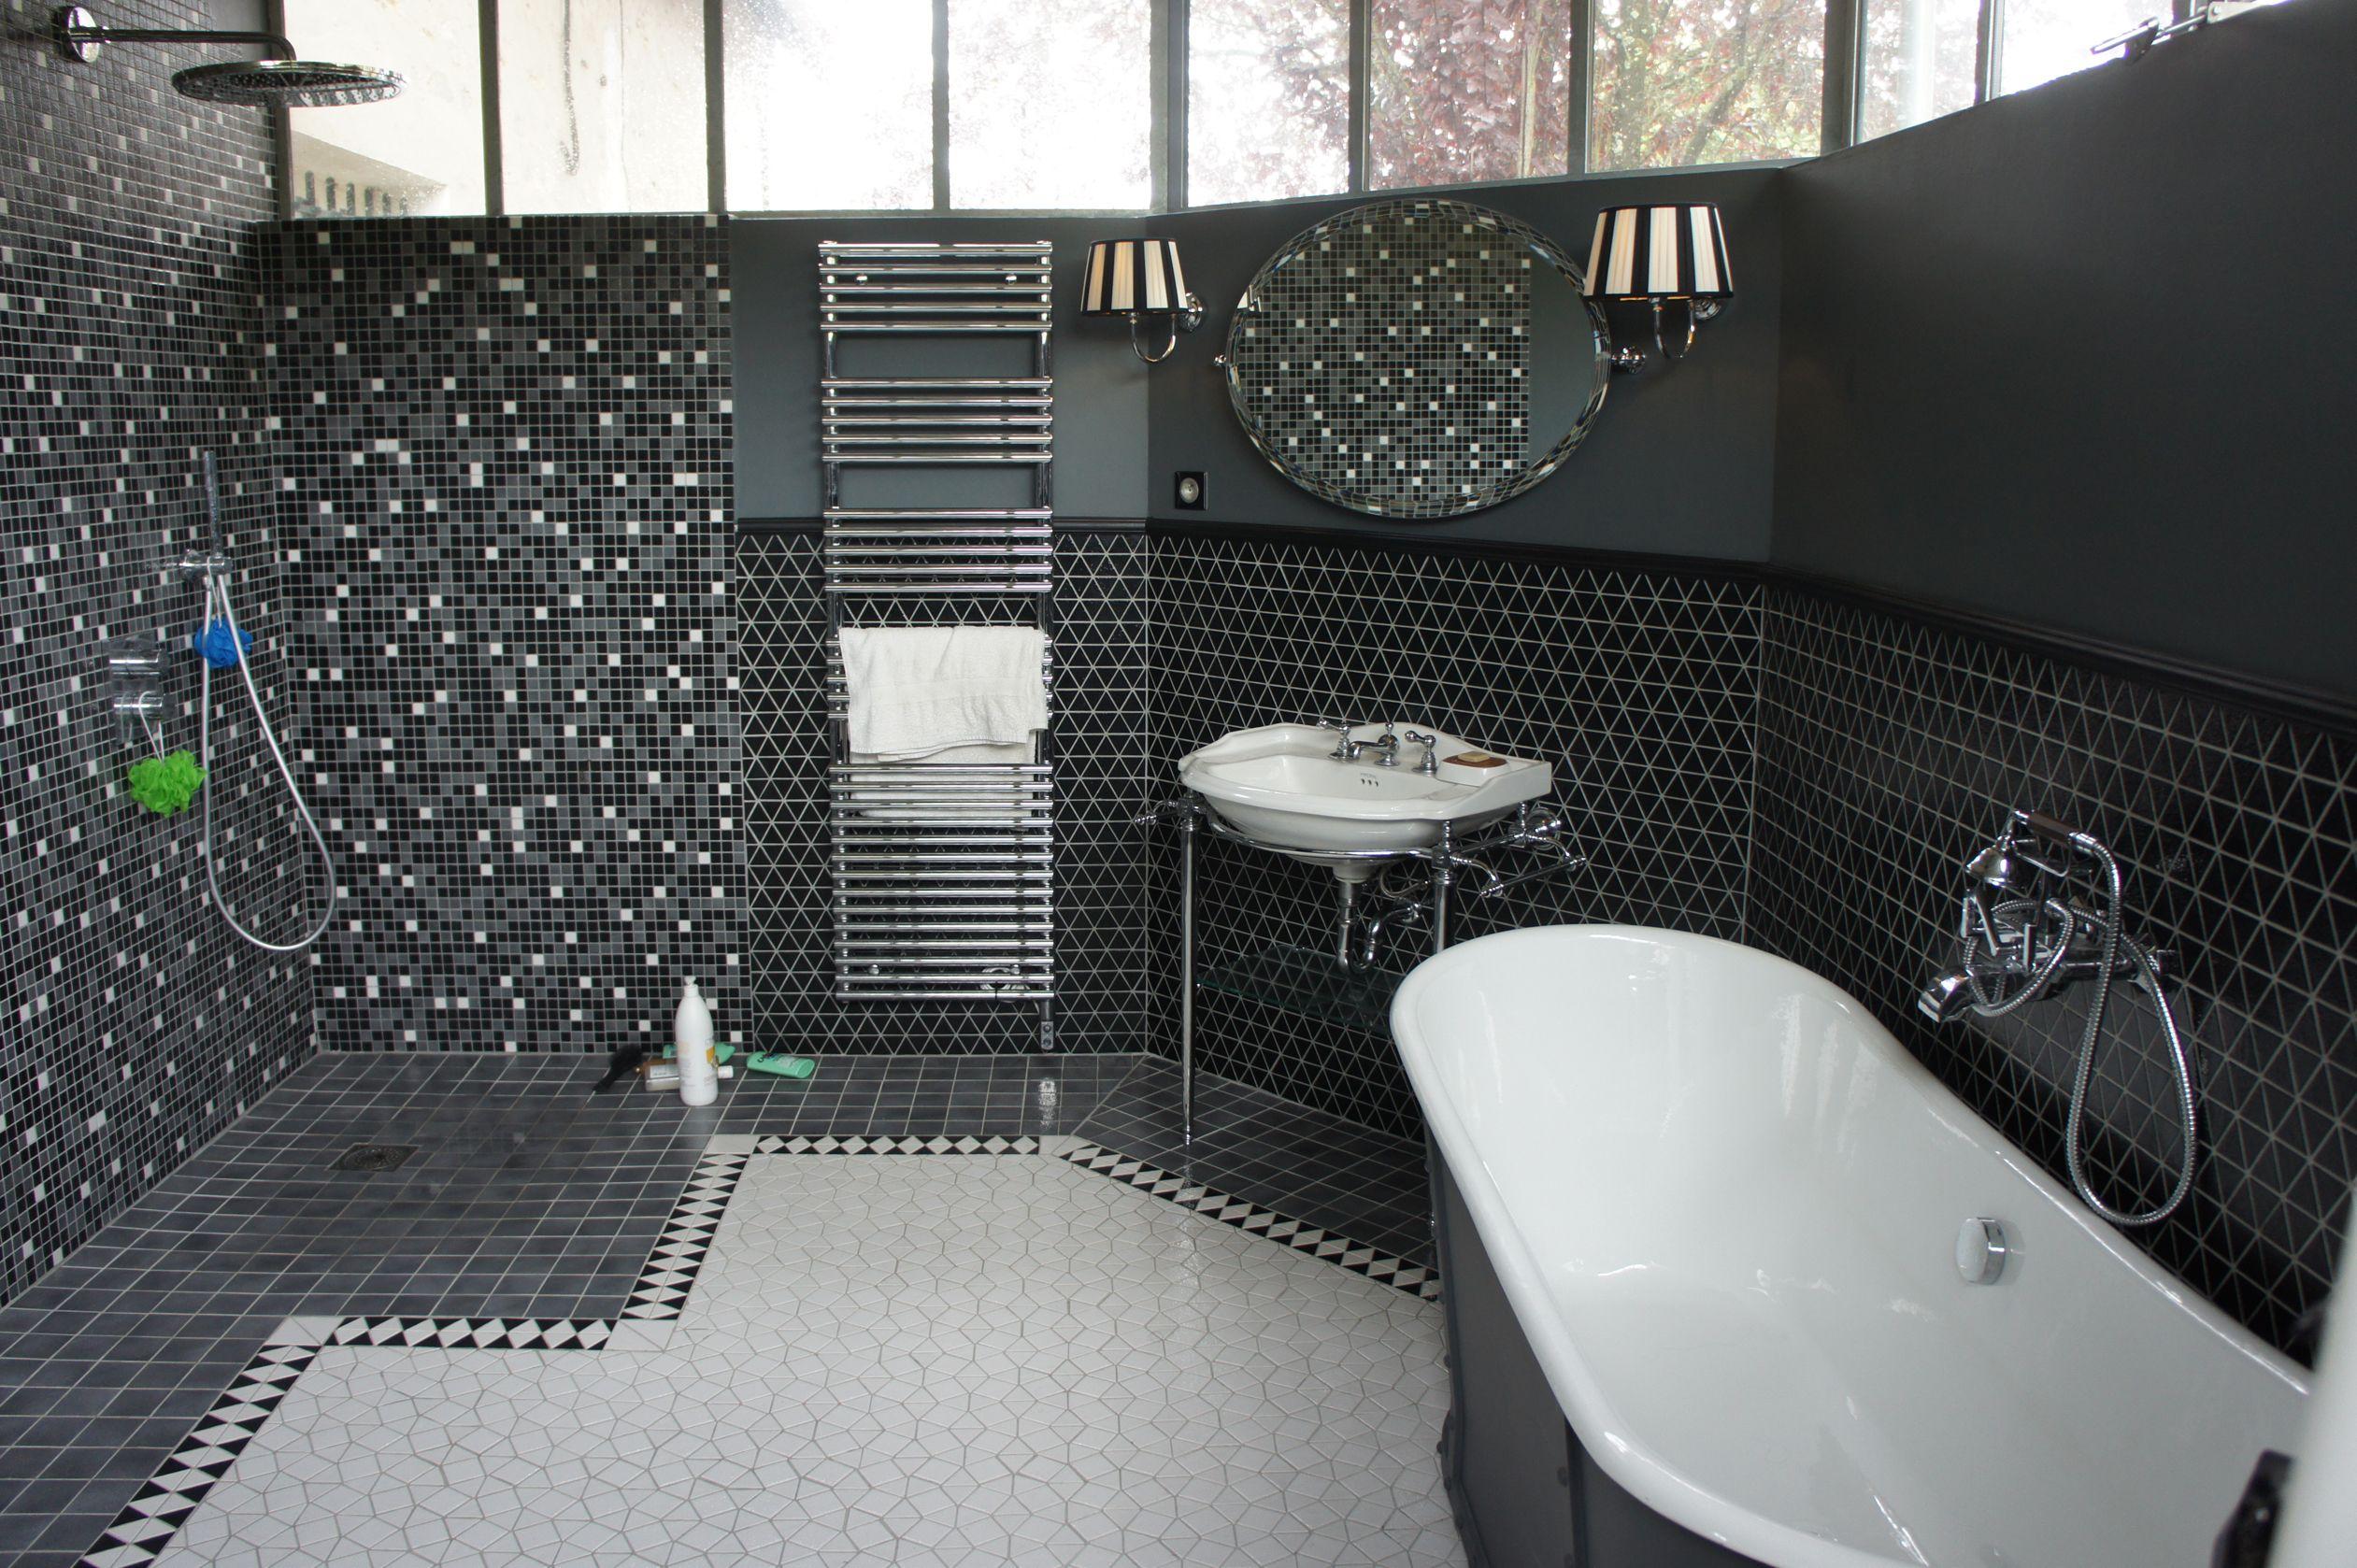 Magasin Meuble Salle De Bain Pau ~ emaux de briare salle de bains derby casablanca